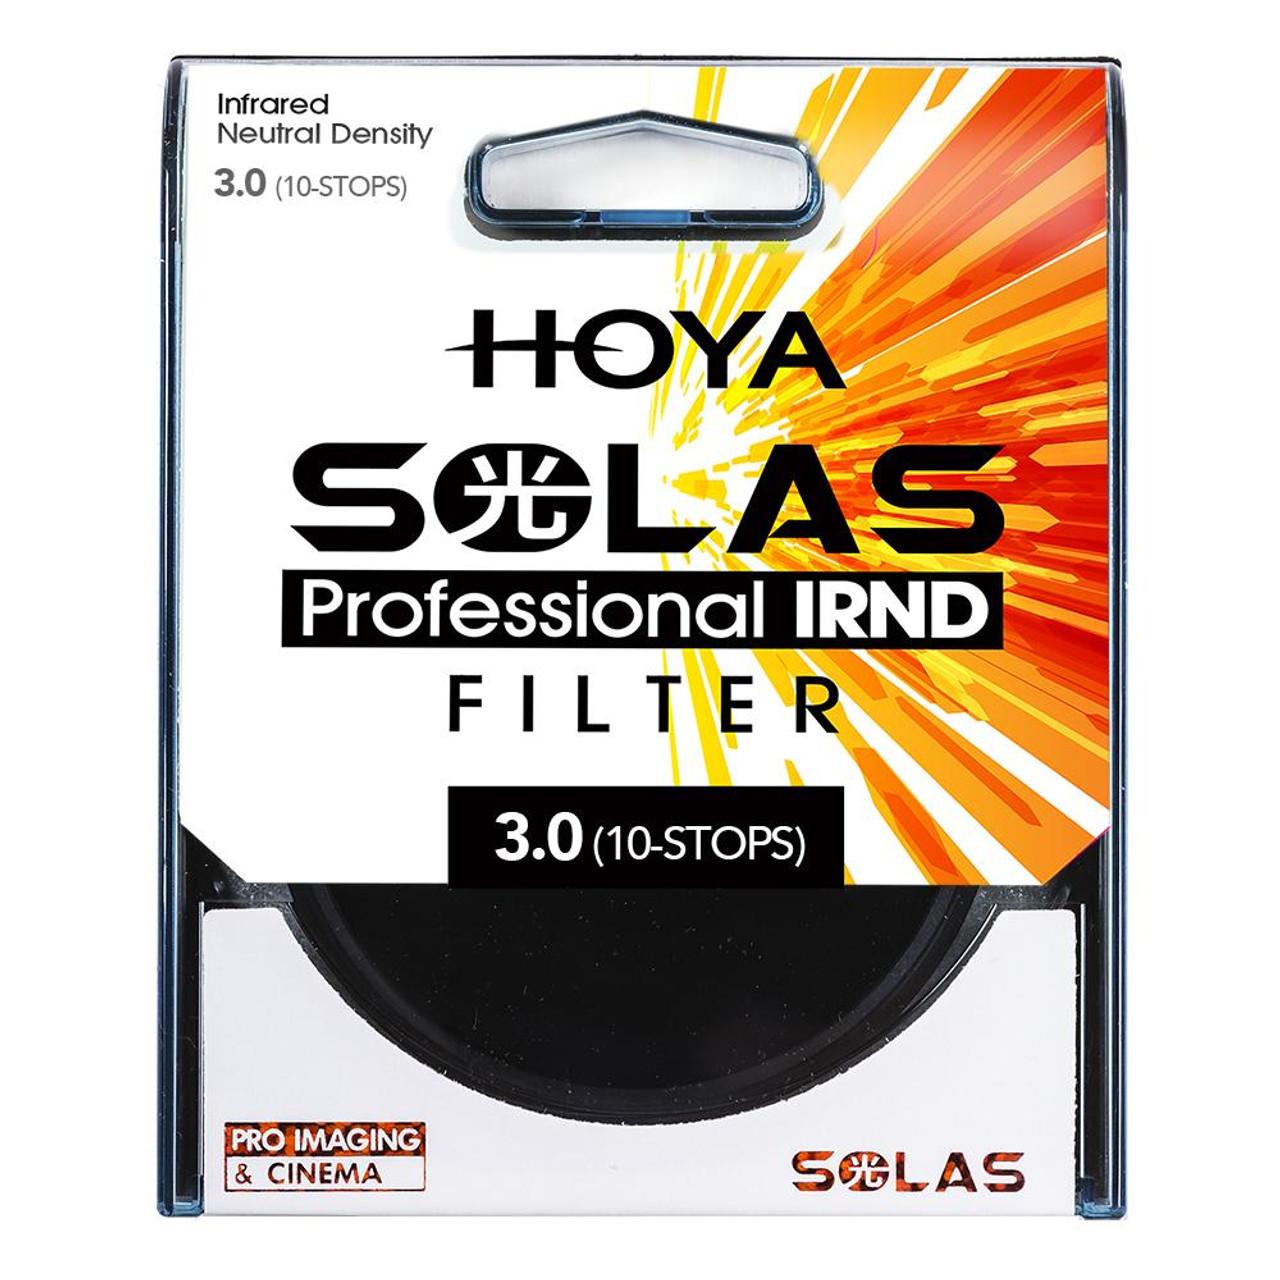 Hoya 77mm SOLAS IRND 3.0 (10-stop)